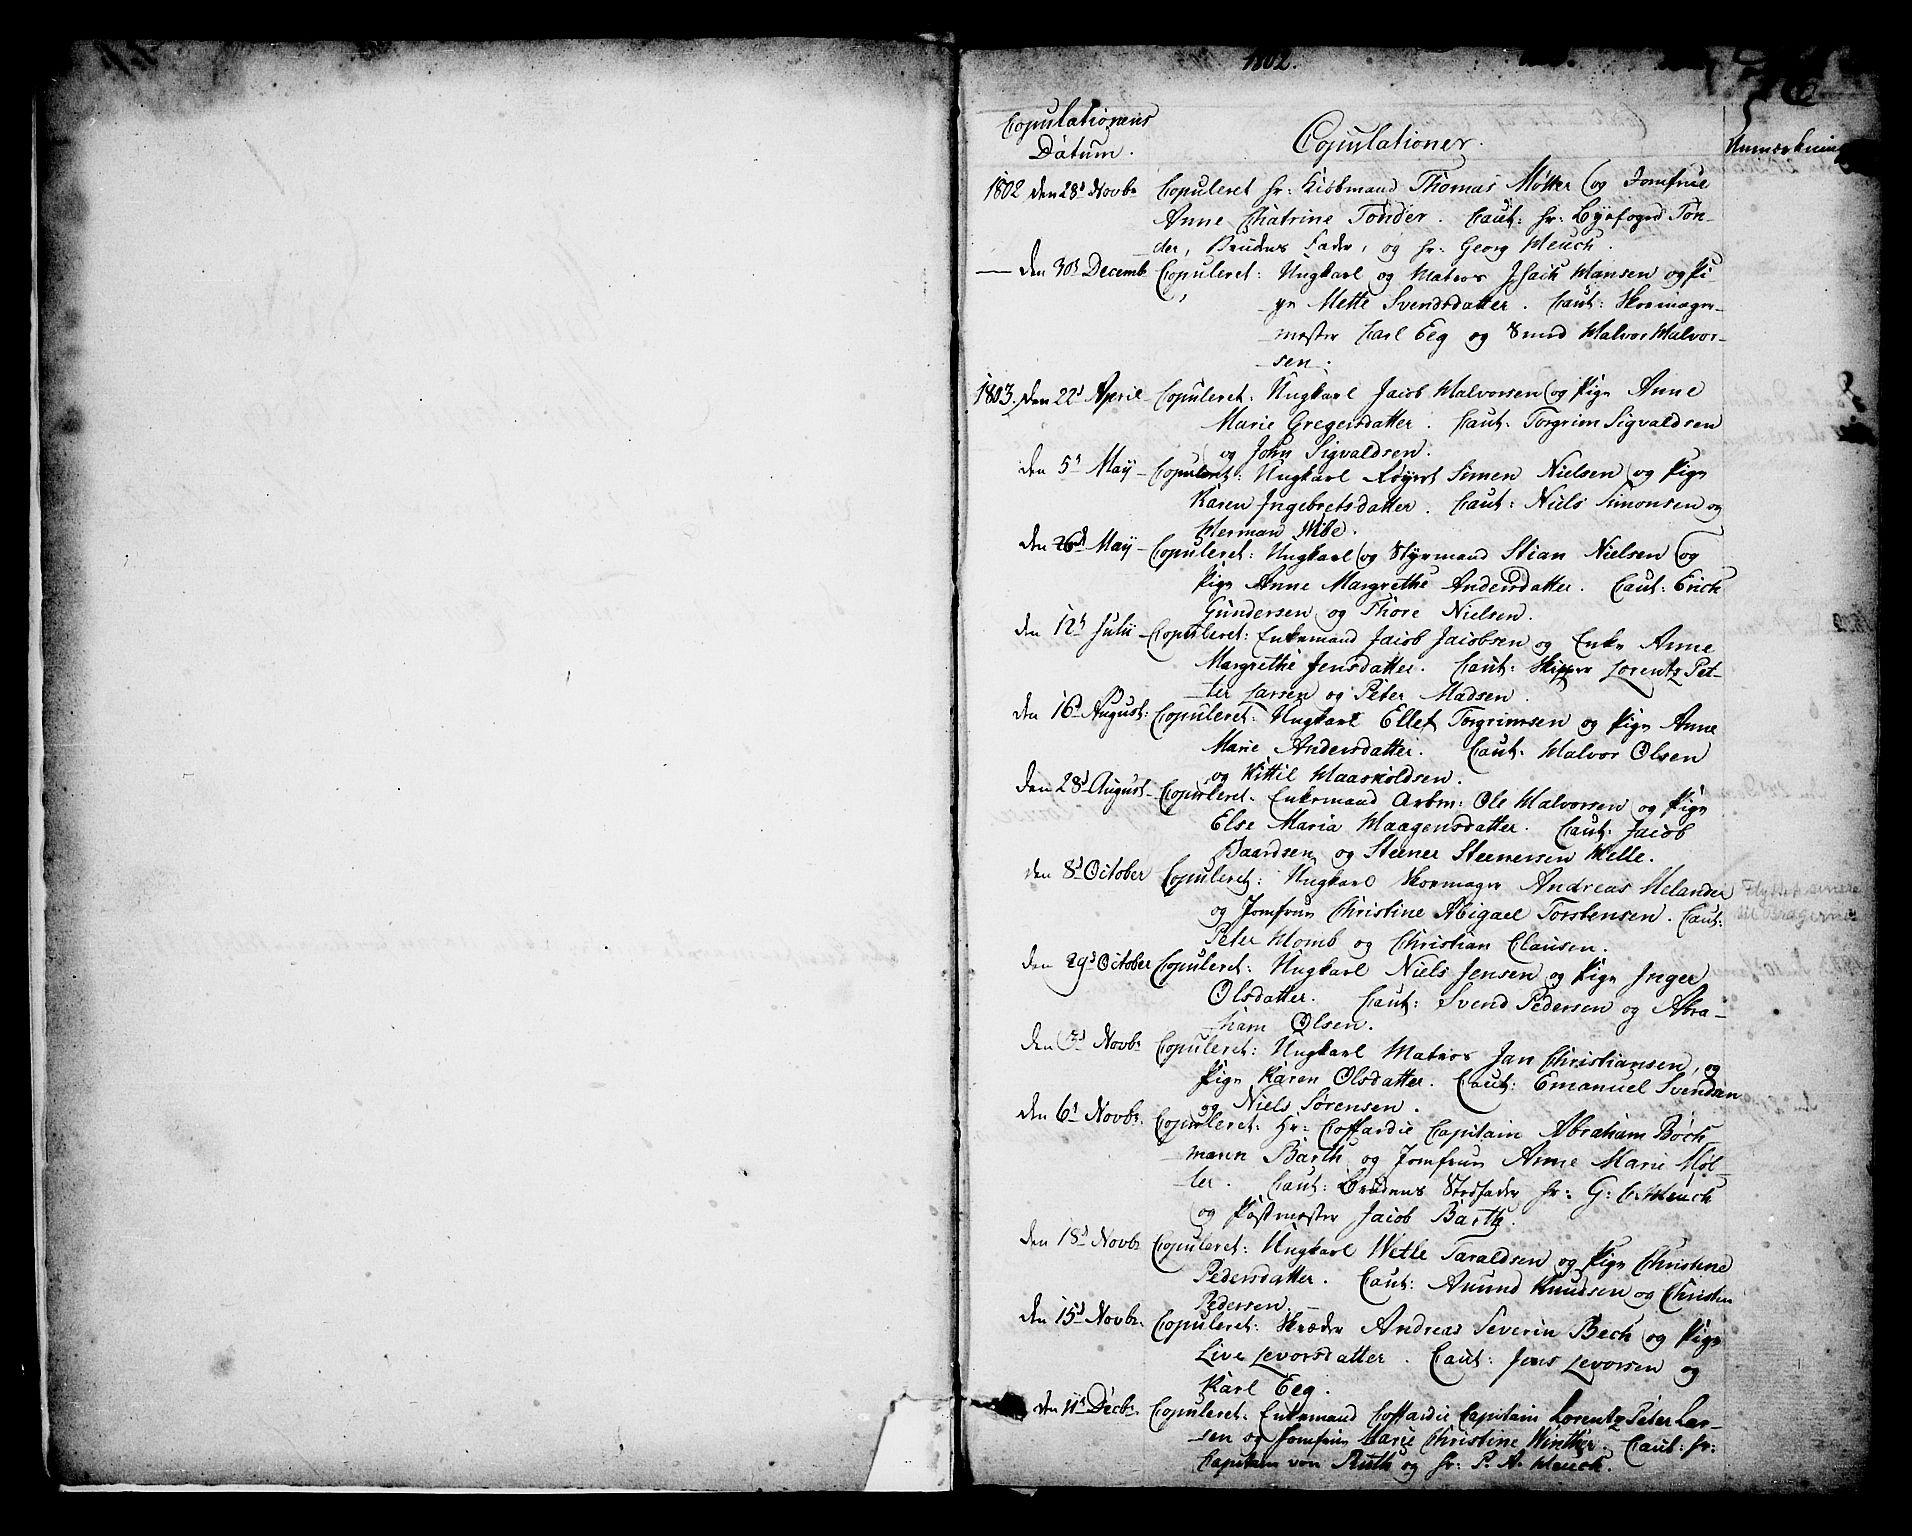 SAKO, Kragerø kirkebøker, F/Fa/L0003: Ministerialbok nr. 3, 1802-1813, s. 1